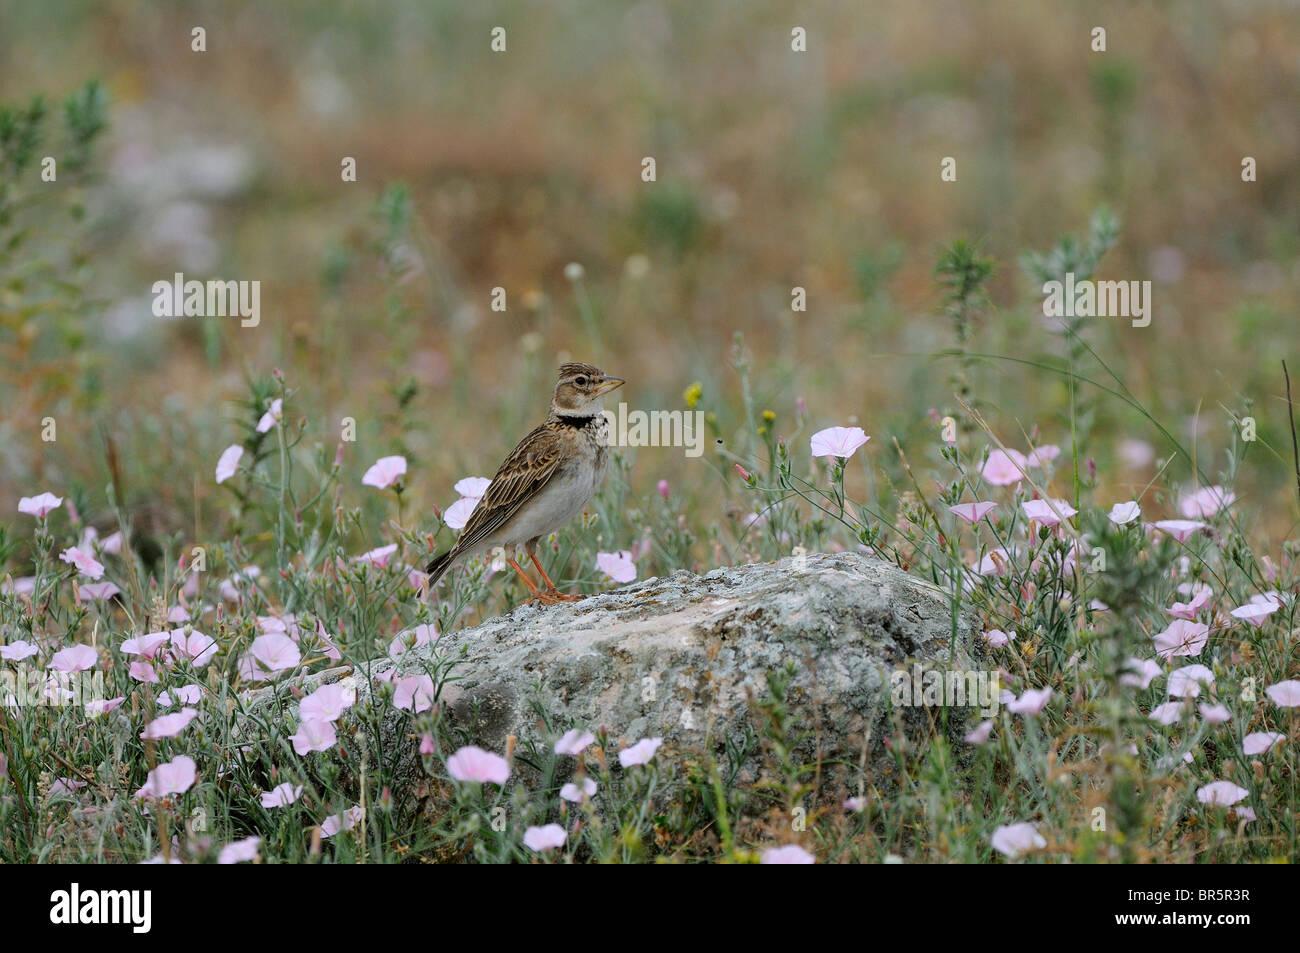 Calandre (Melanocorypha calandra) perché sur la roche sur le sol, la Bulgarie Photo Stock